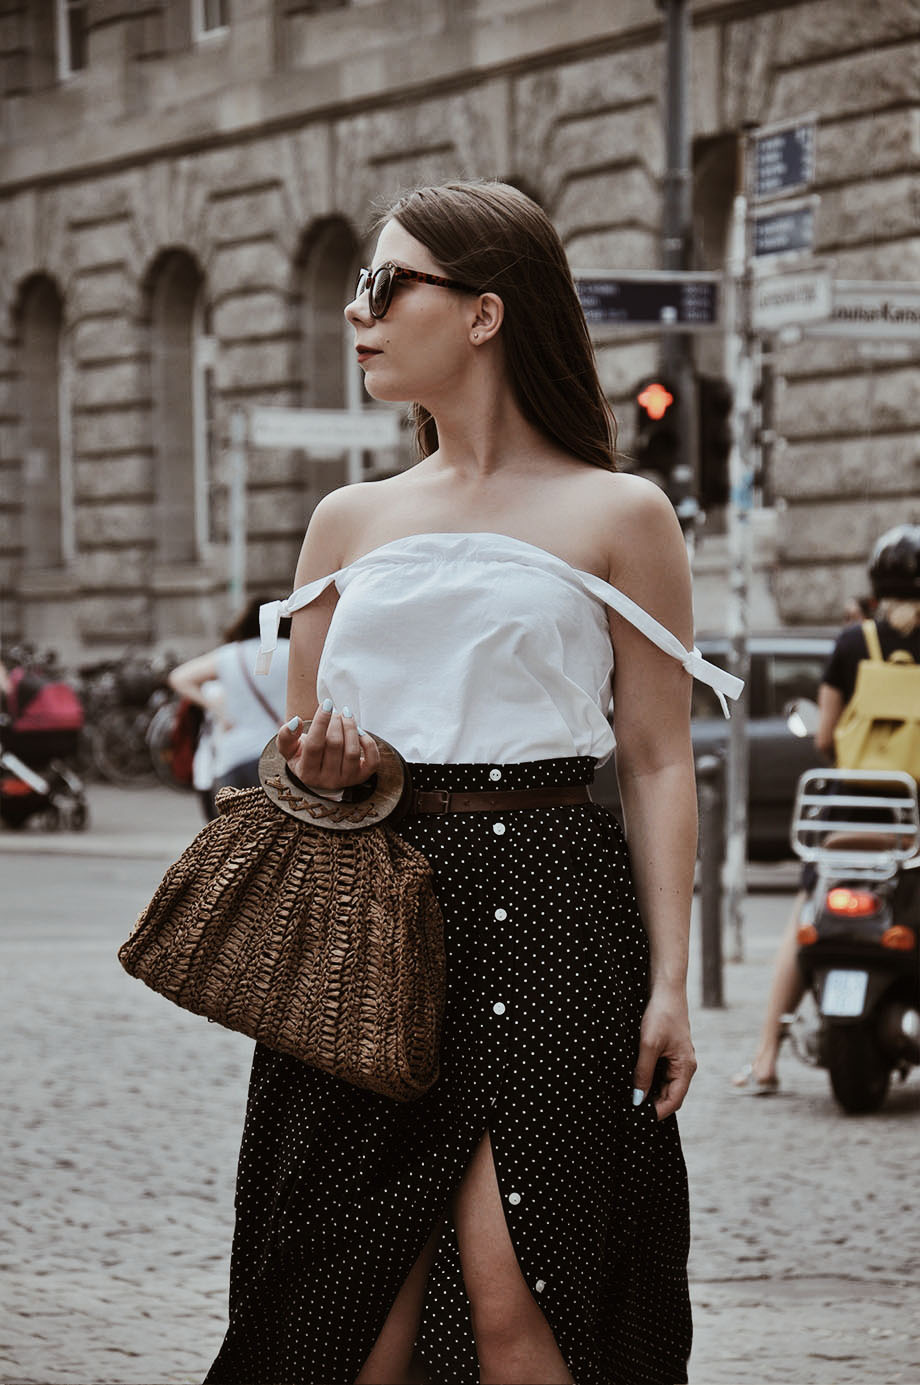 Martiarti | Blog szyciowy: Długa rozpinana spódnica na kilka